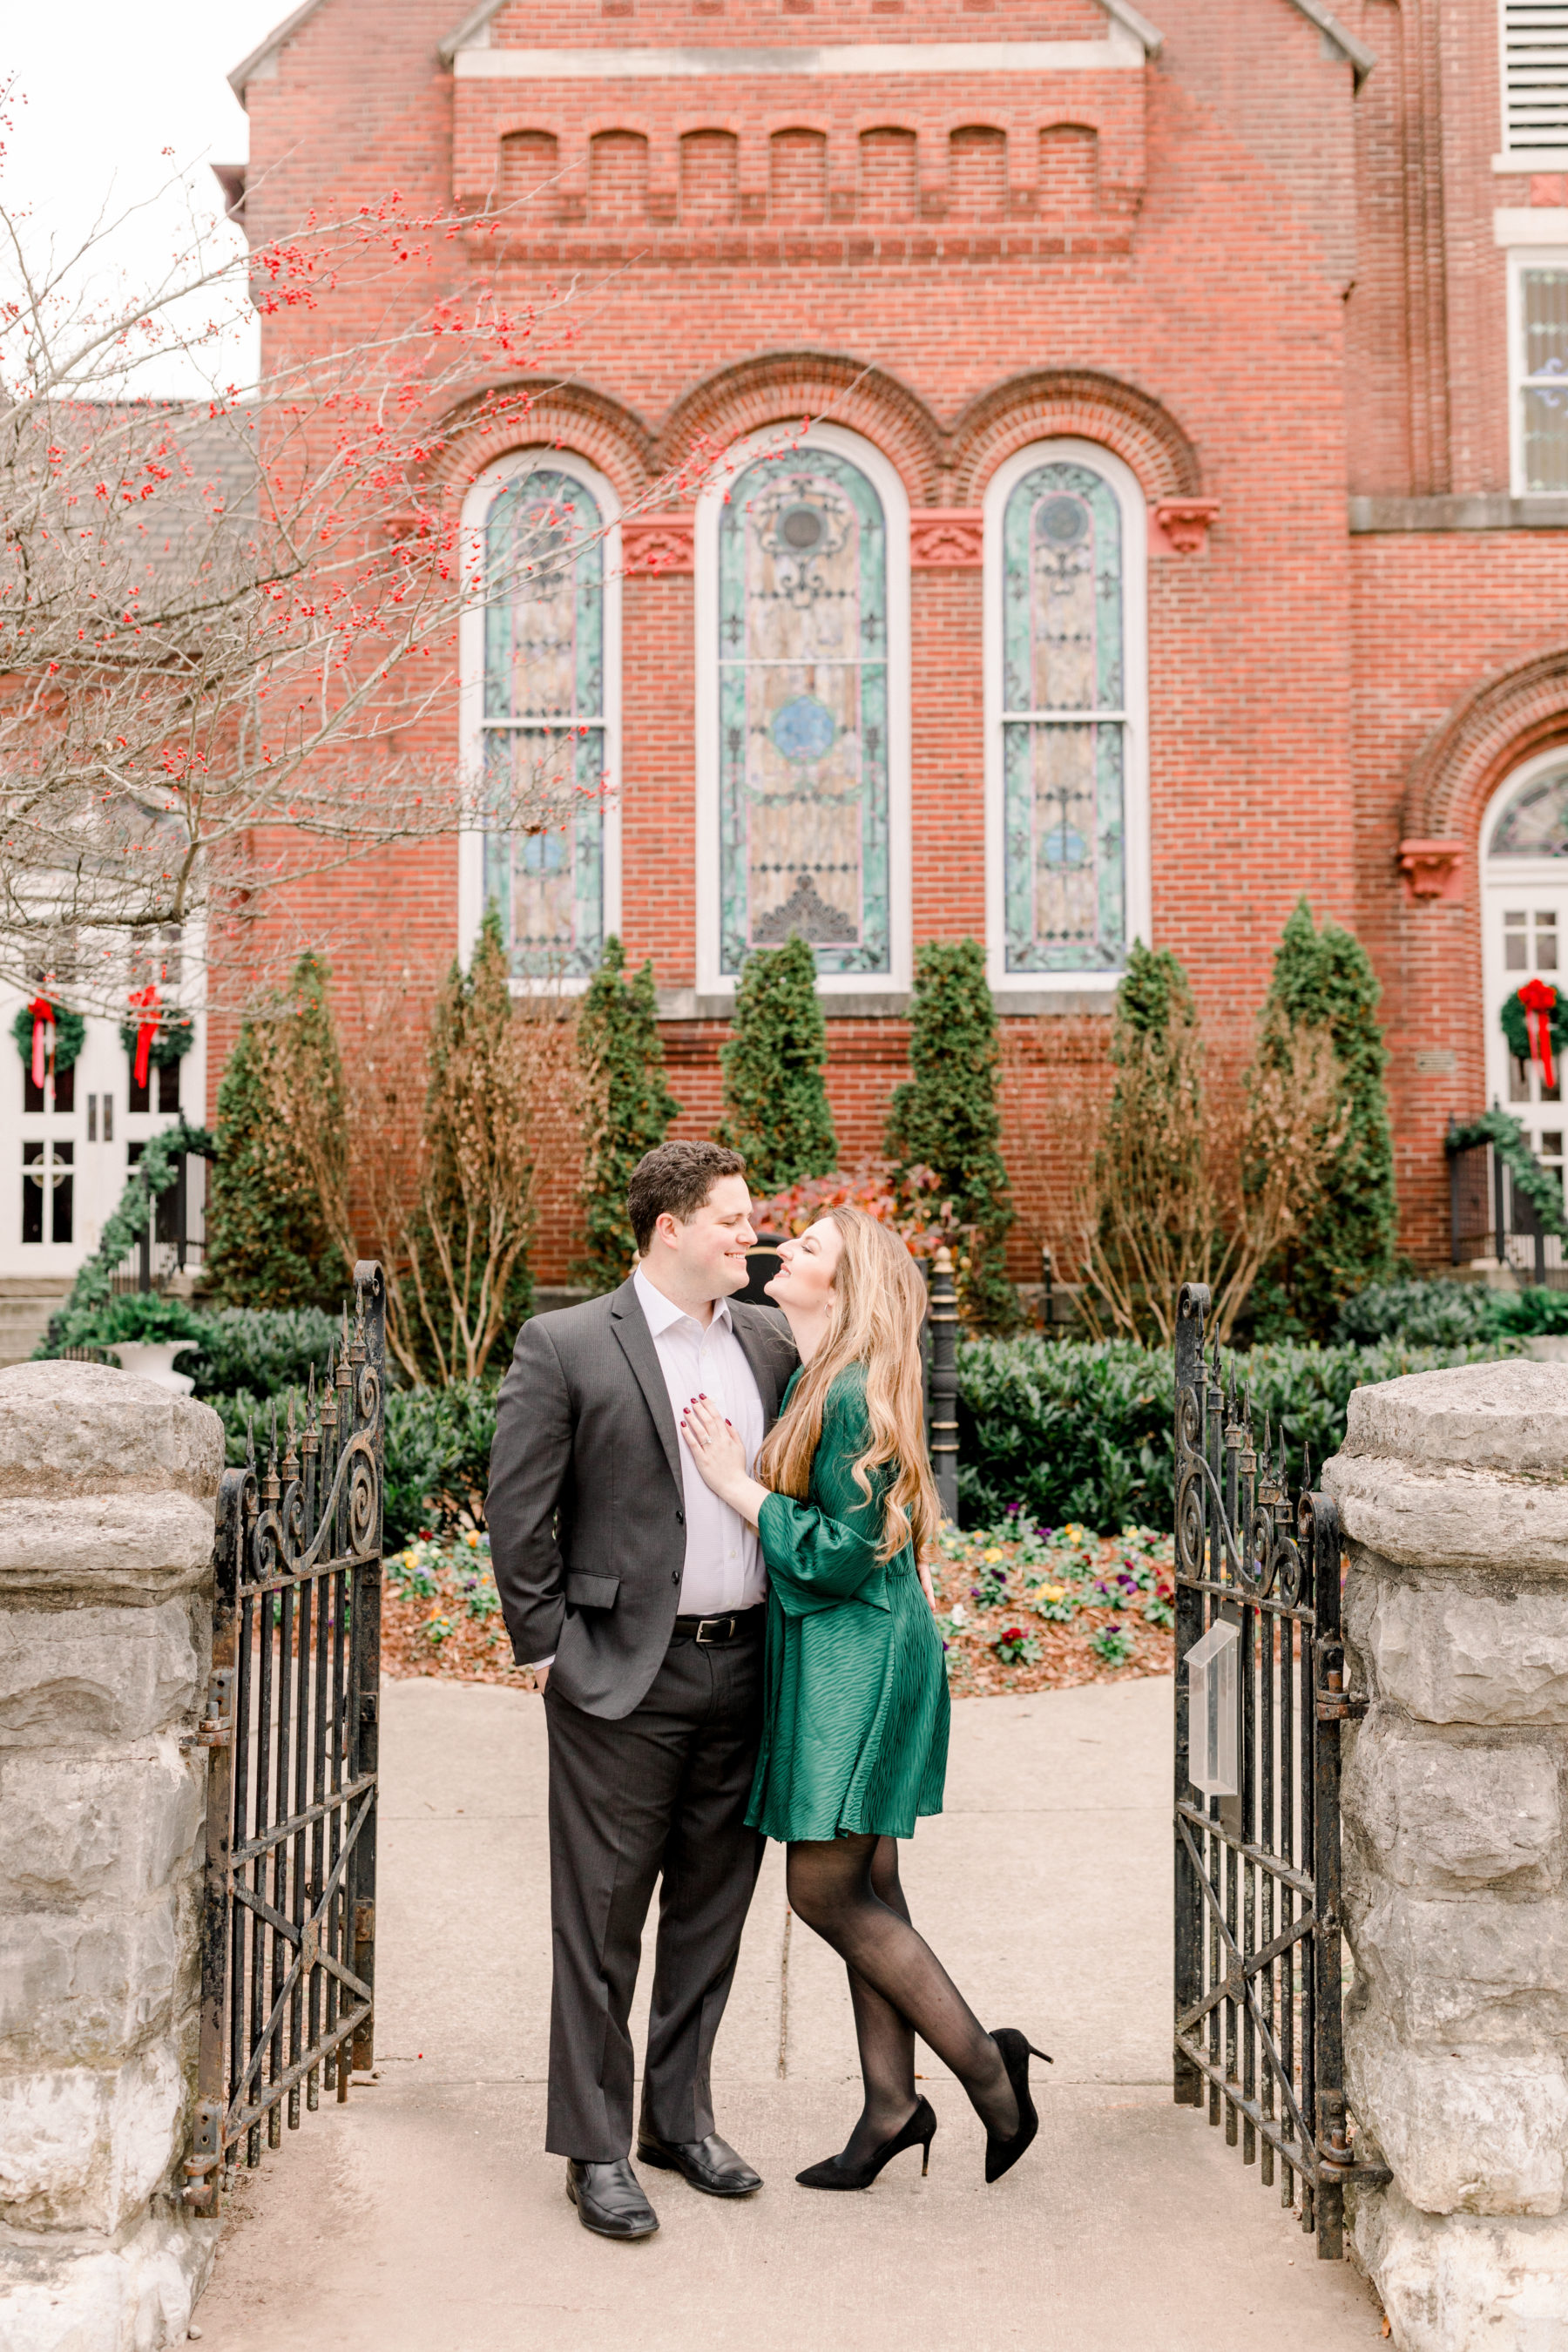 Nashville engagement photographer Lindsey Brown Photography featured on Nashville Bride Guide